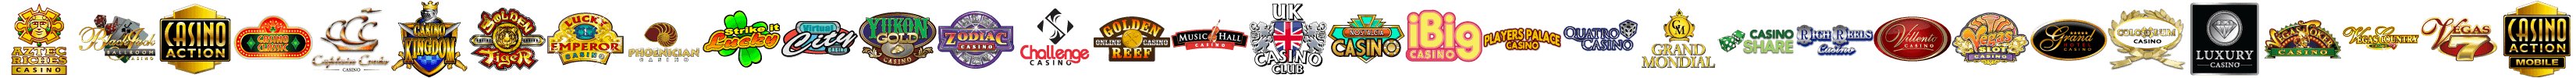 http://i74.servimg.com/u/f74/13/42/00/54/casino10.png